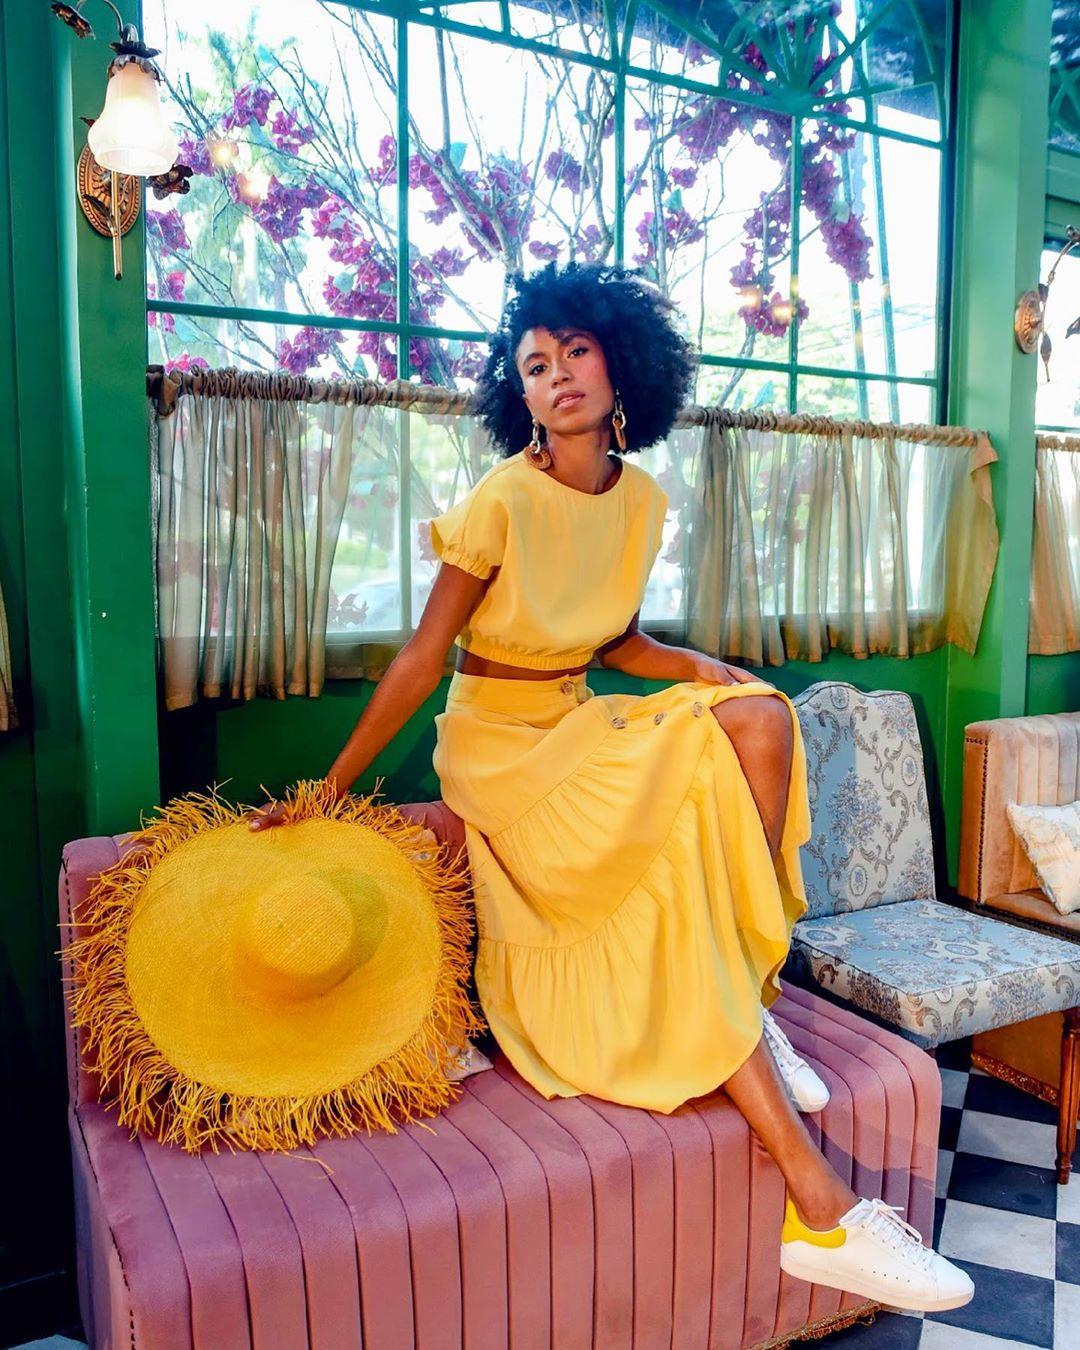 mulher com look amarelo